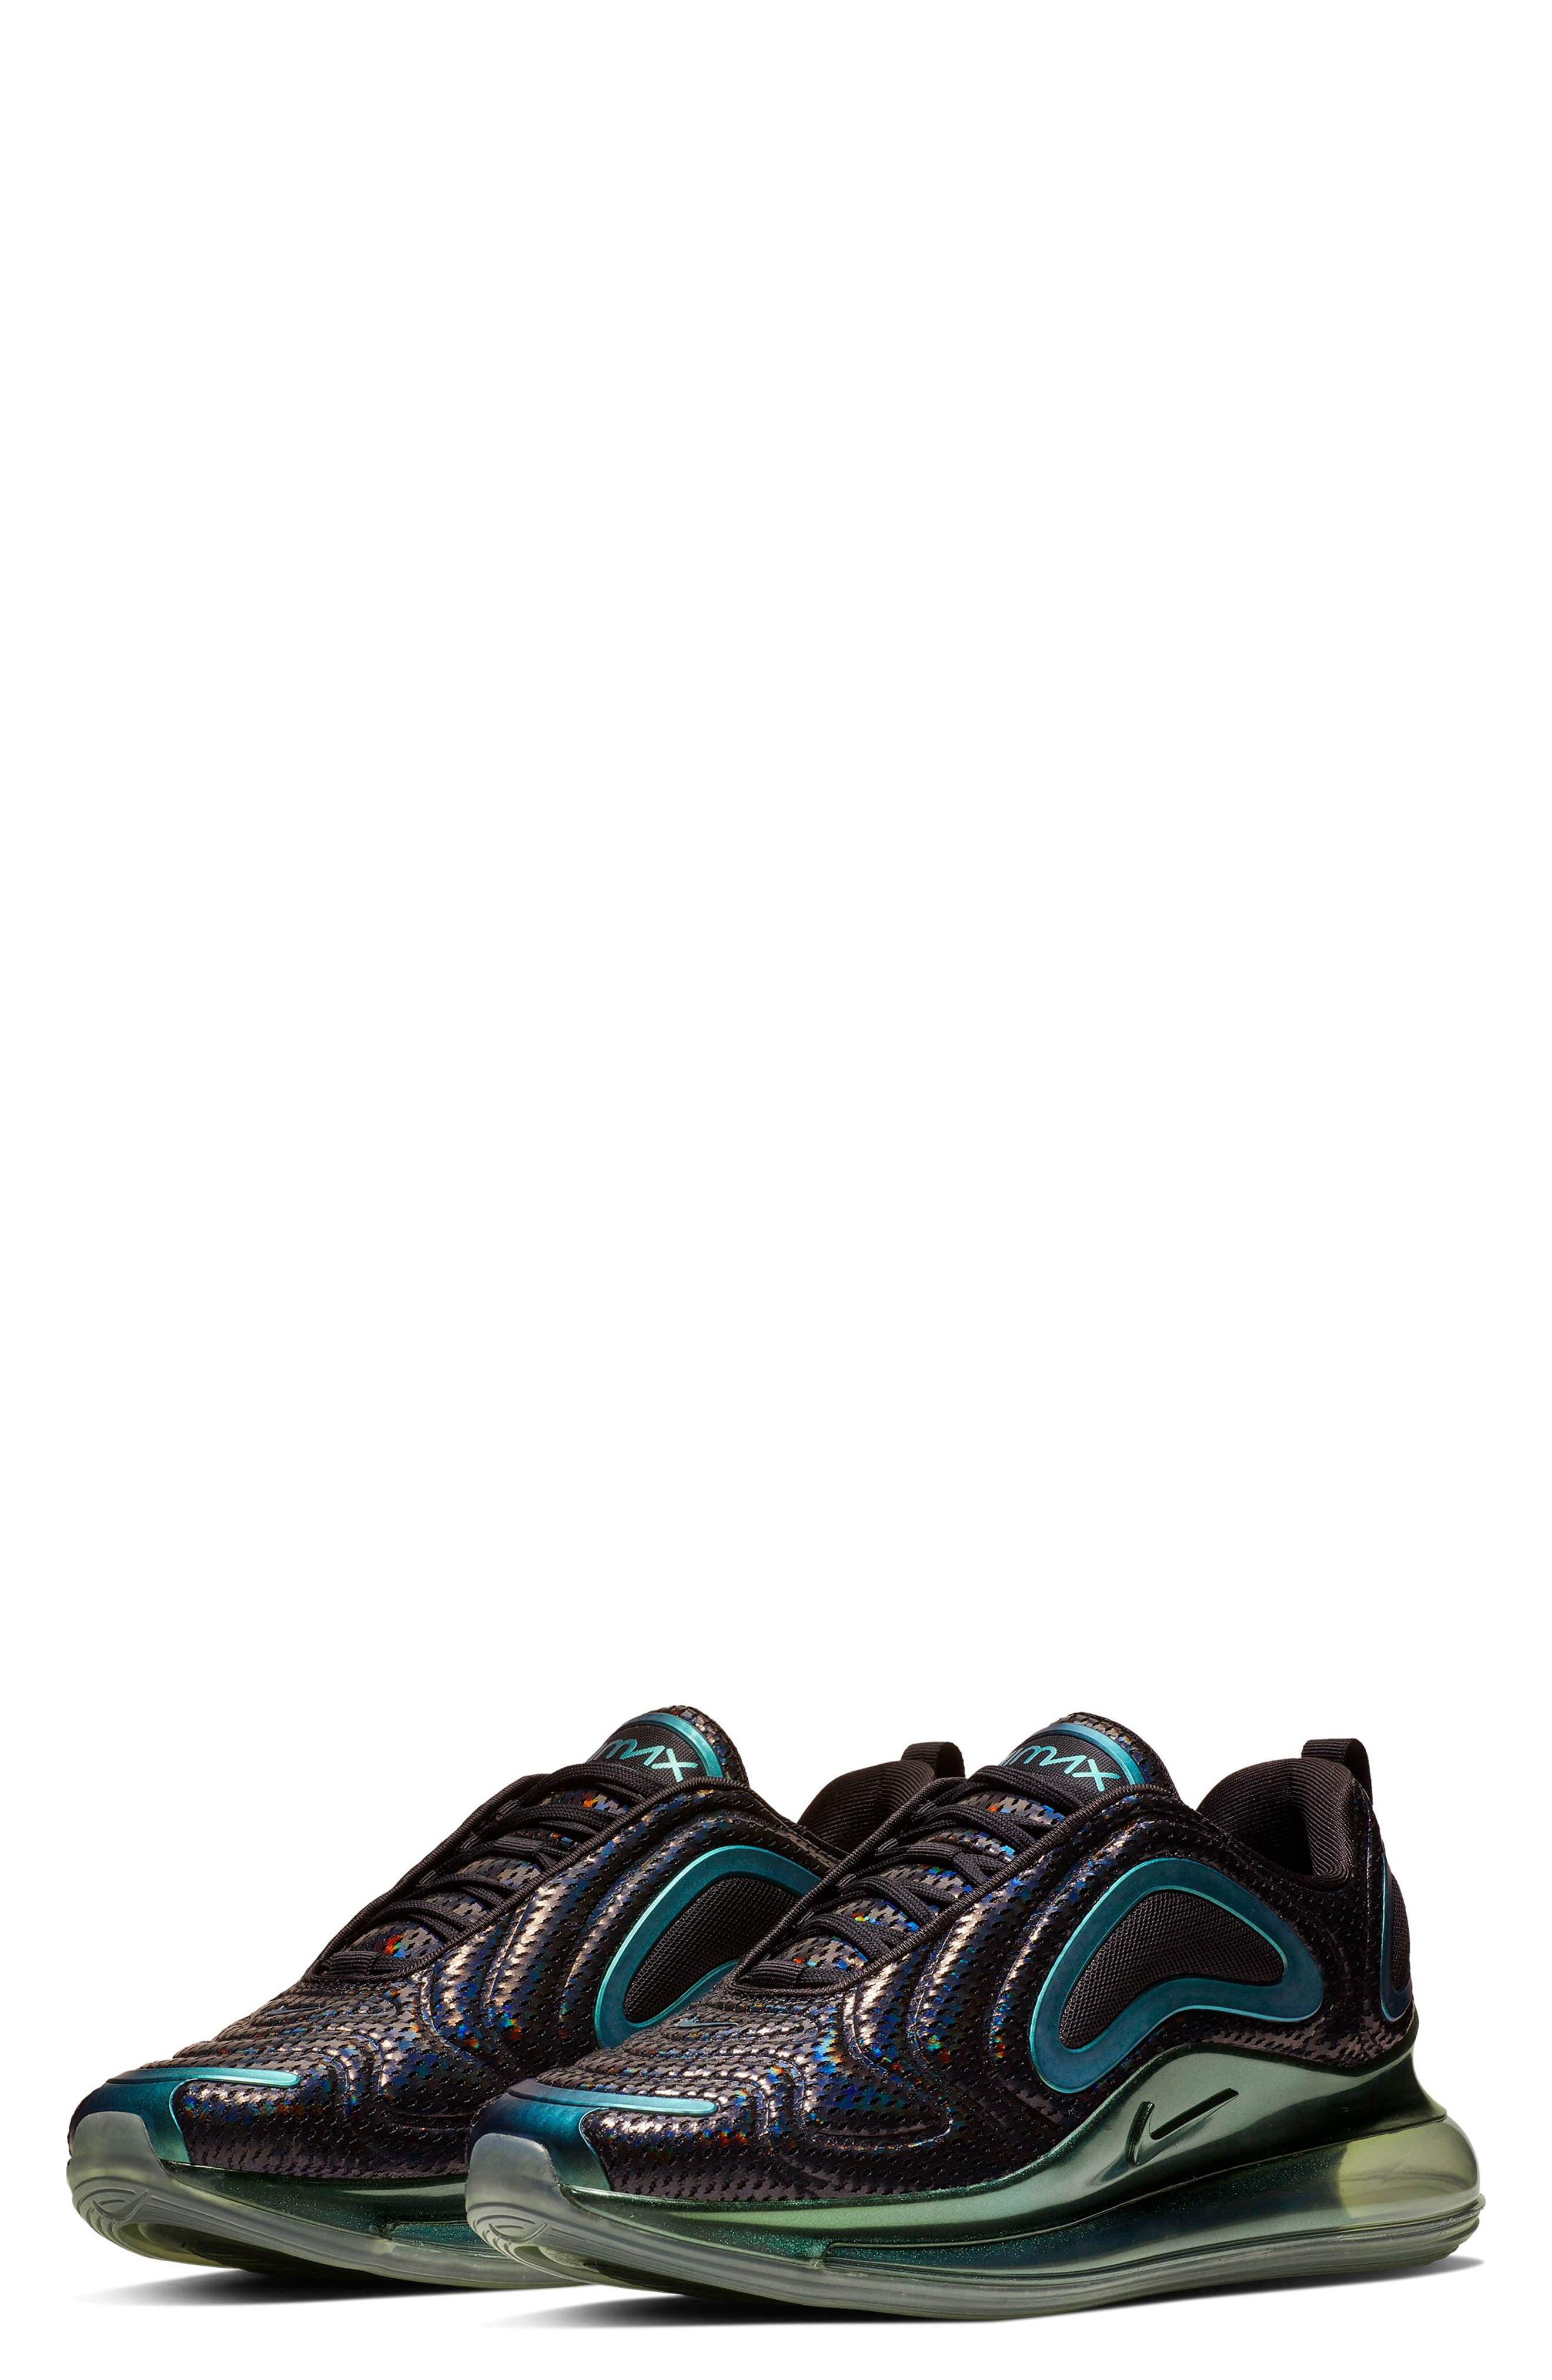 NIKE Air Max 720 Sneaker, Main, color, BLACK/ FUCHSIA/ ANTHRACITE